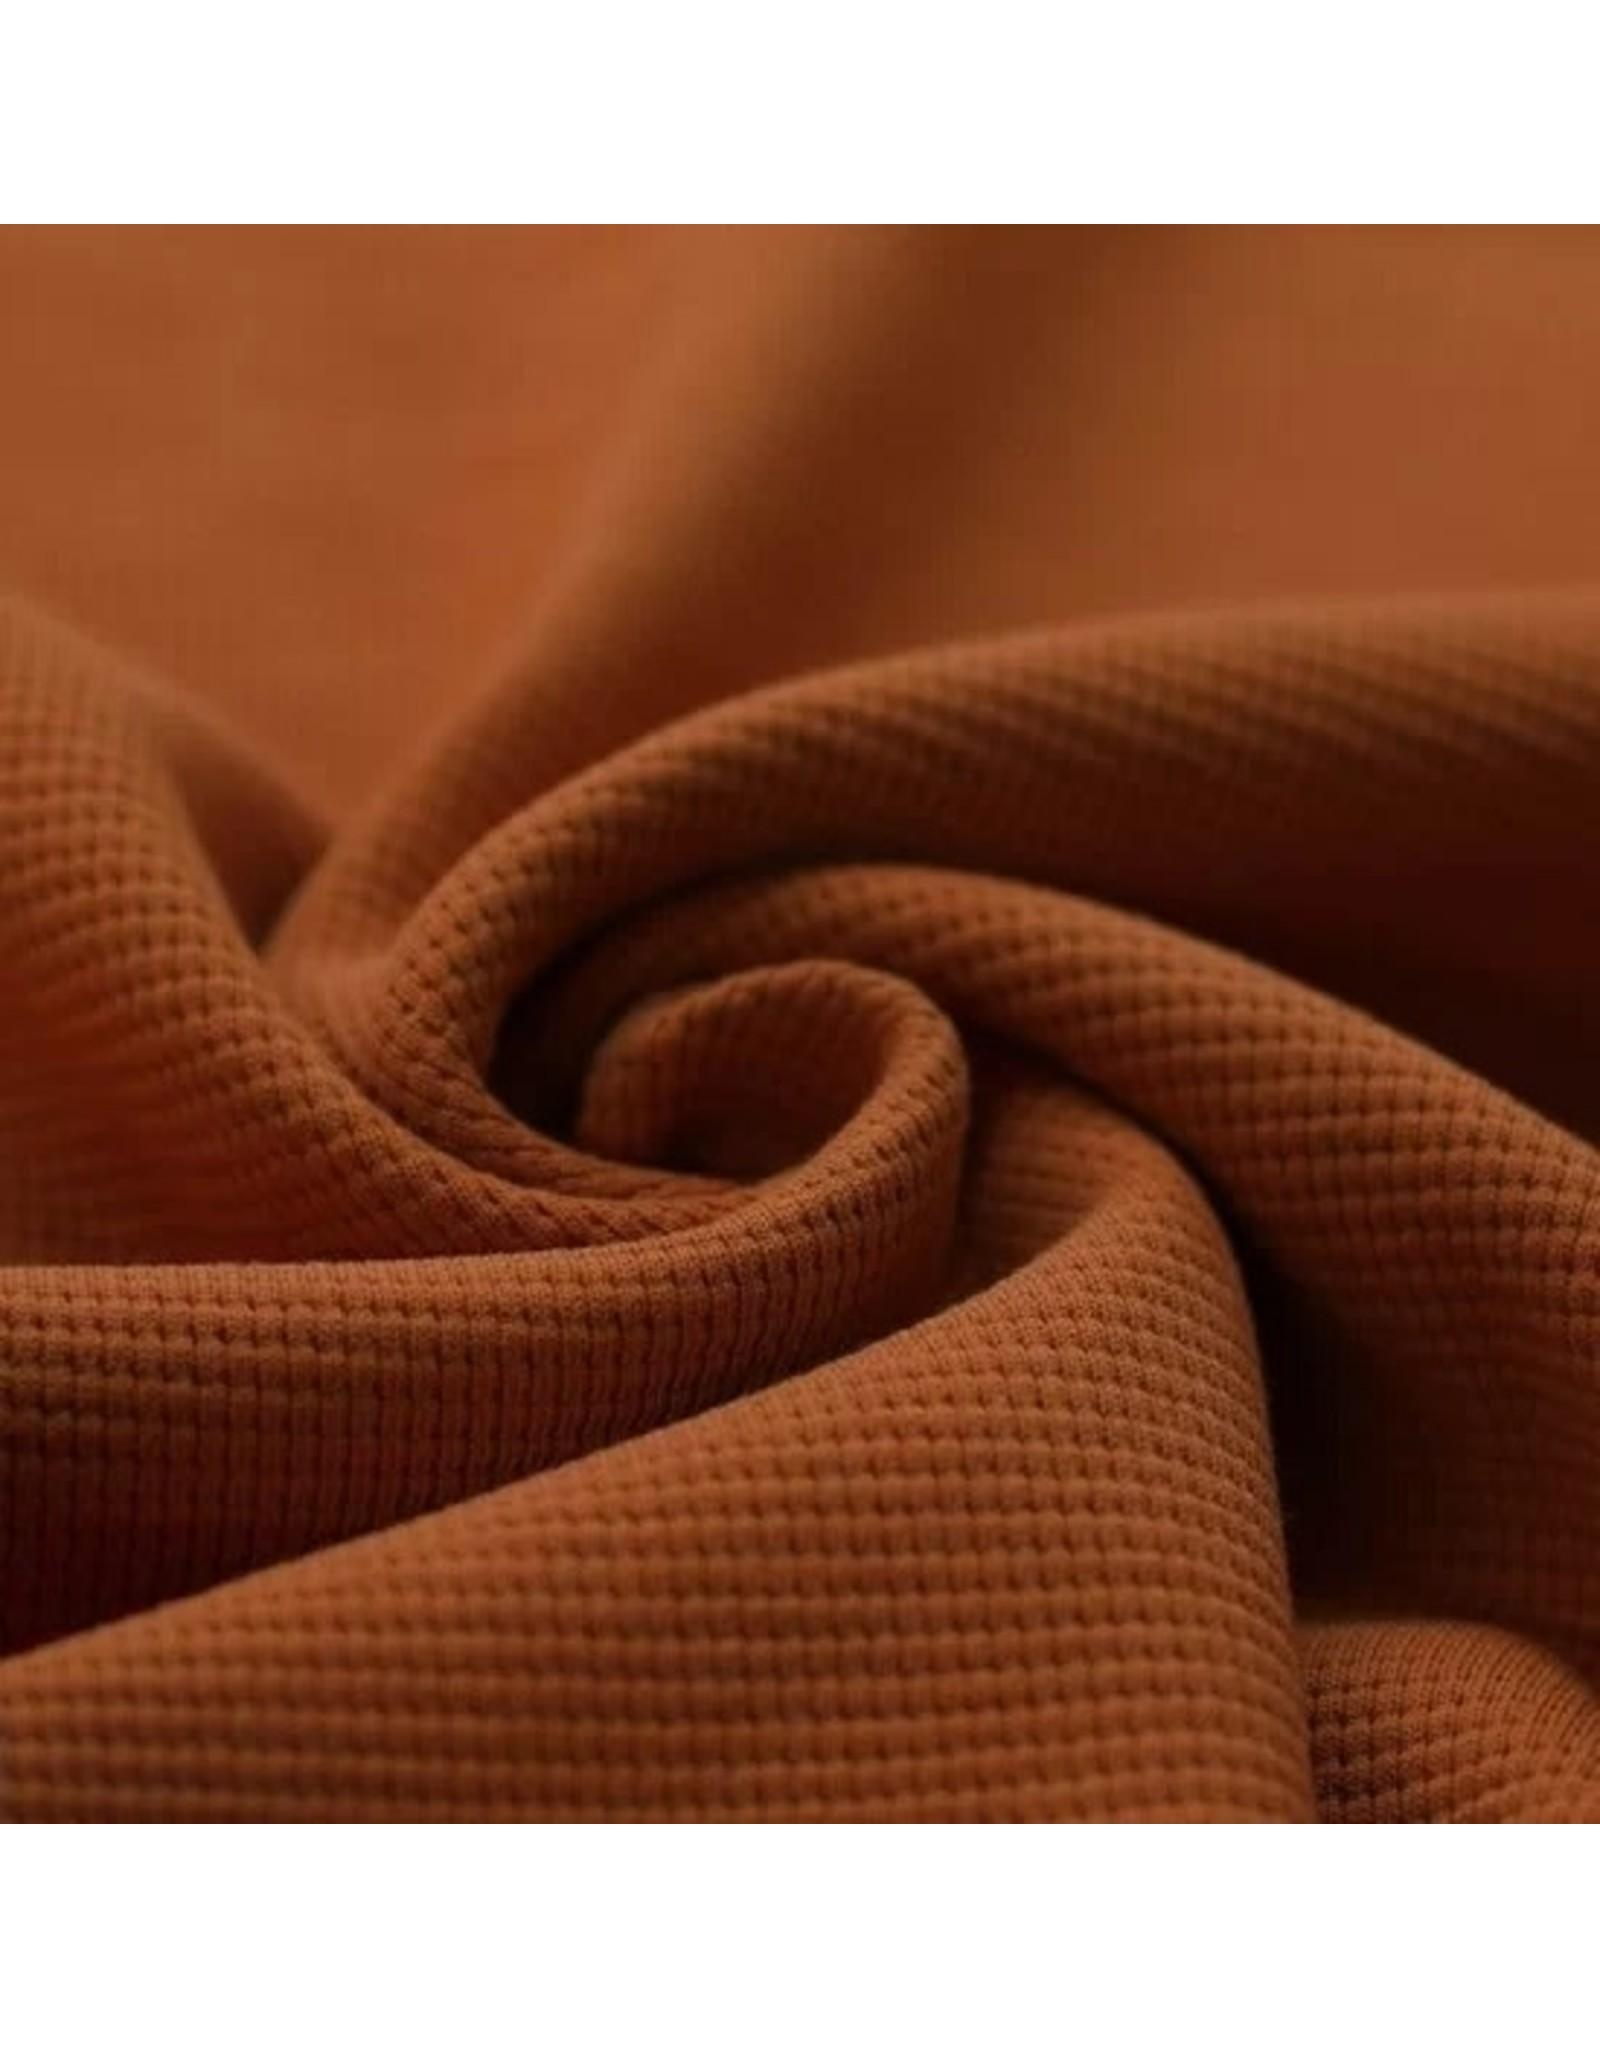 Stik-Stof Wafel knit jersey cognac